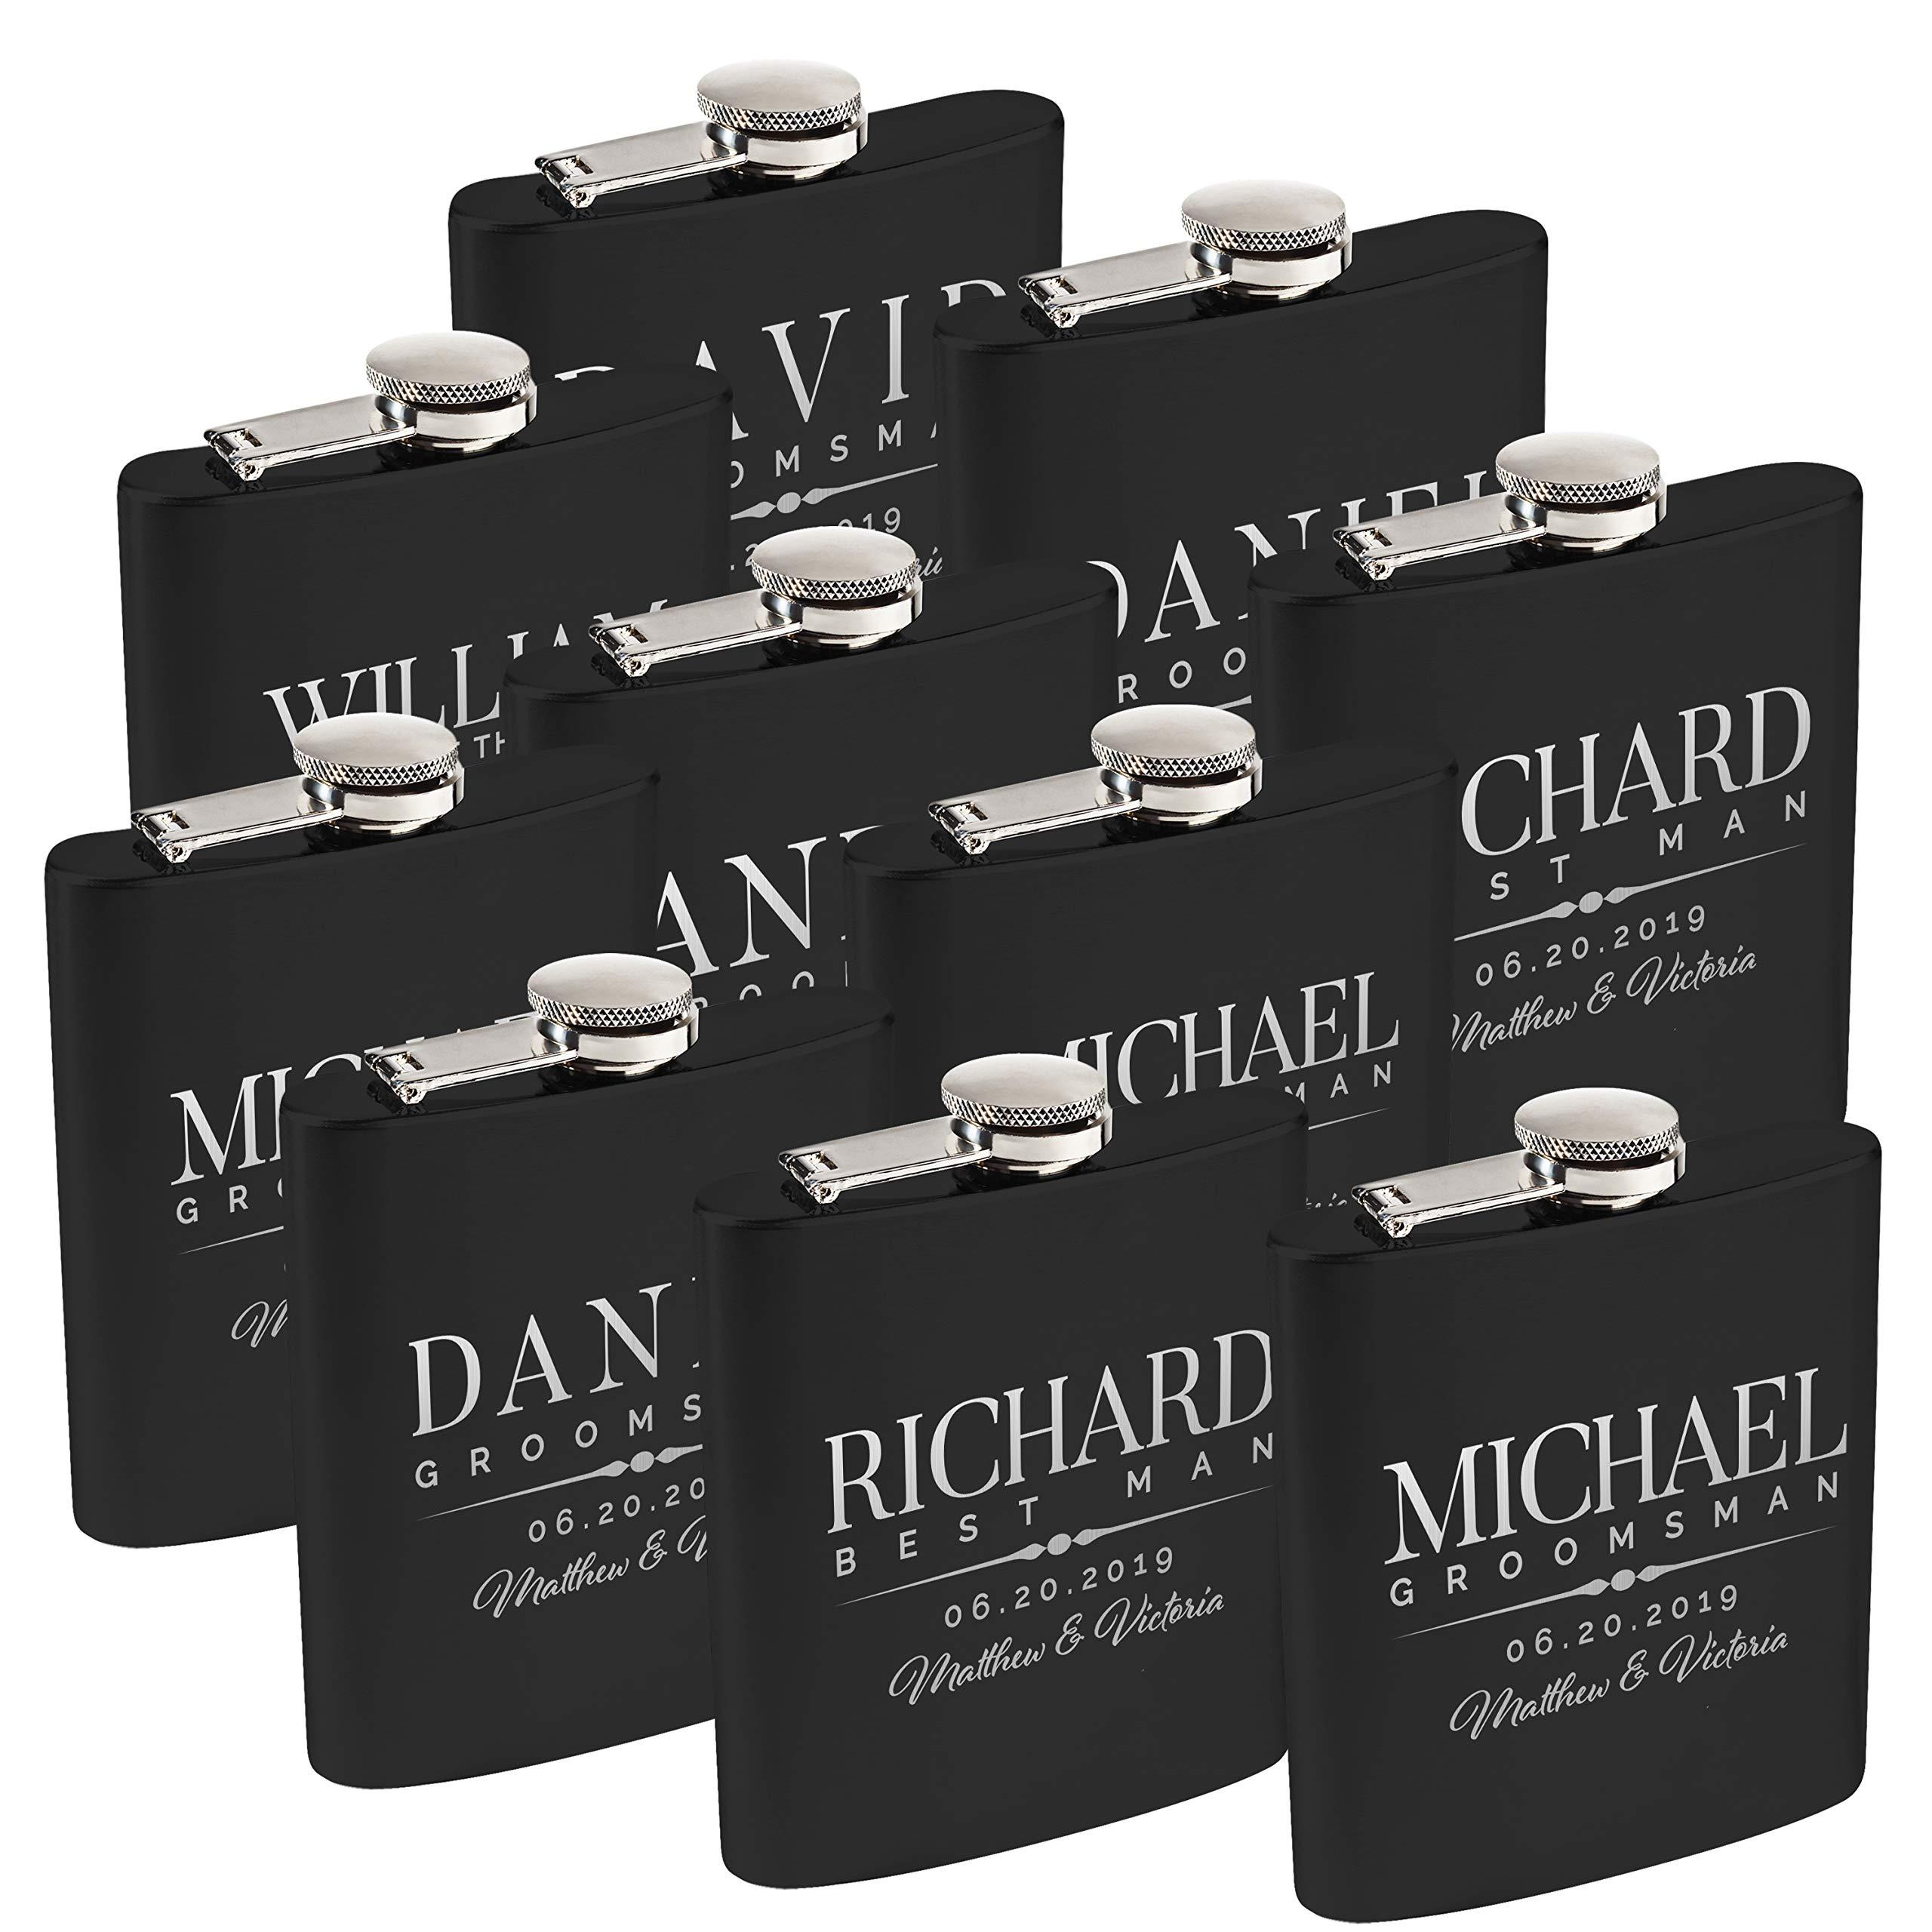 Personalized Flask For Wedding Groomsmen Gift, Customized Flask Set FREE Personalization - Laser Engraved - Design -5 (Black, 10)